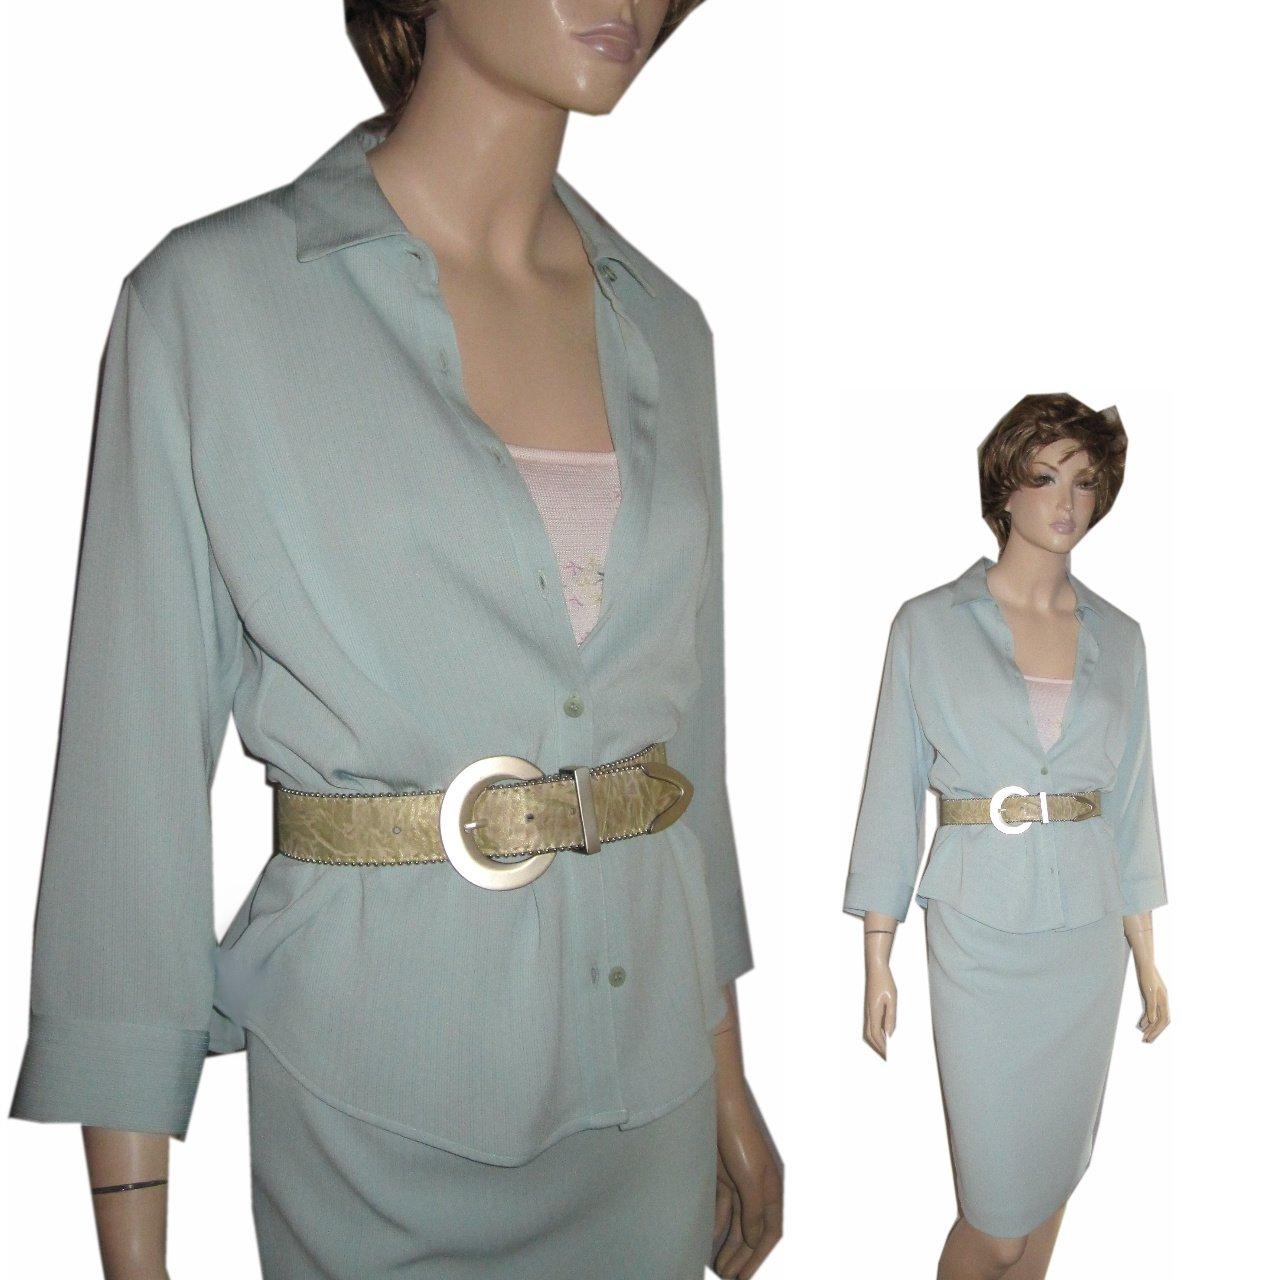 sz 6 ALEX GARFIELD Skirt Suit Set in Aquamarine $49.99 - List price $336